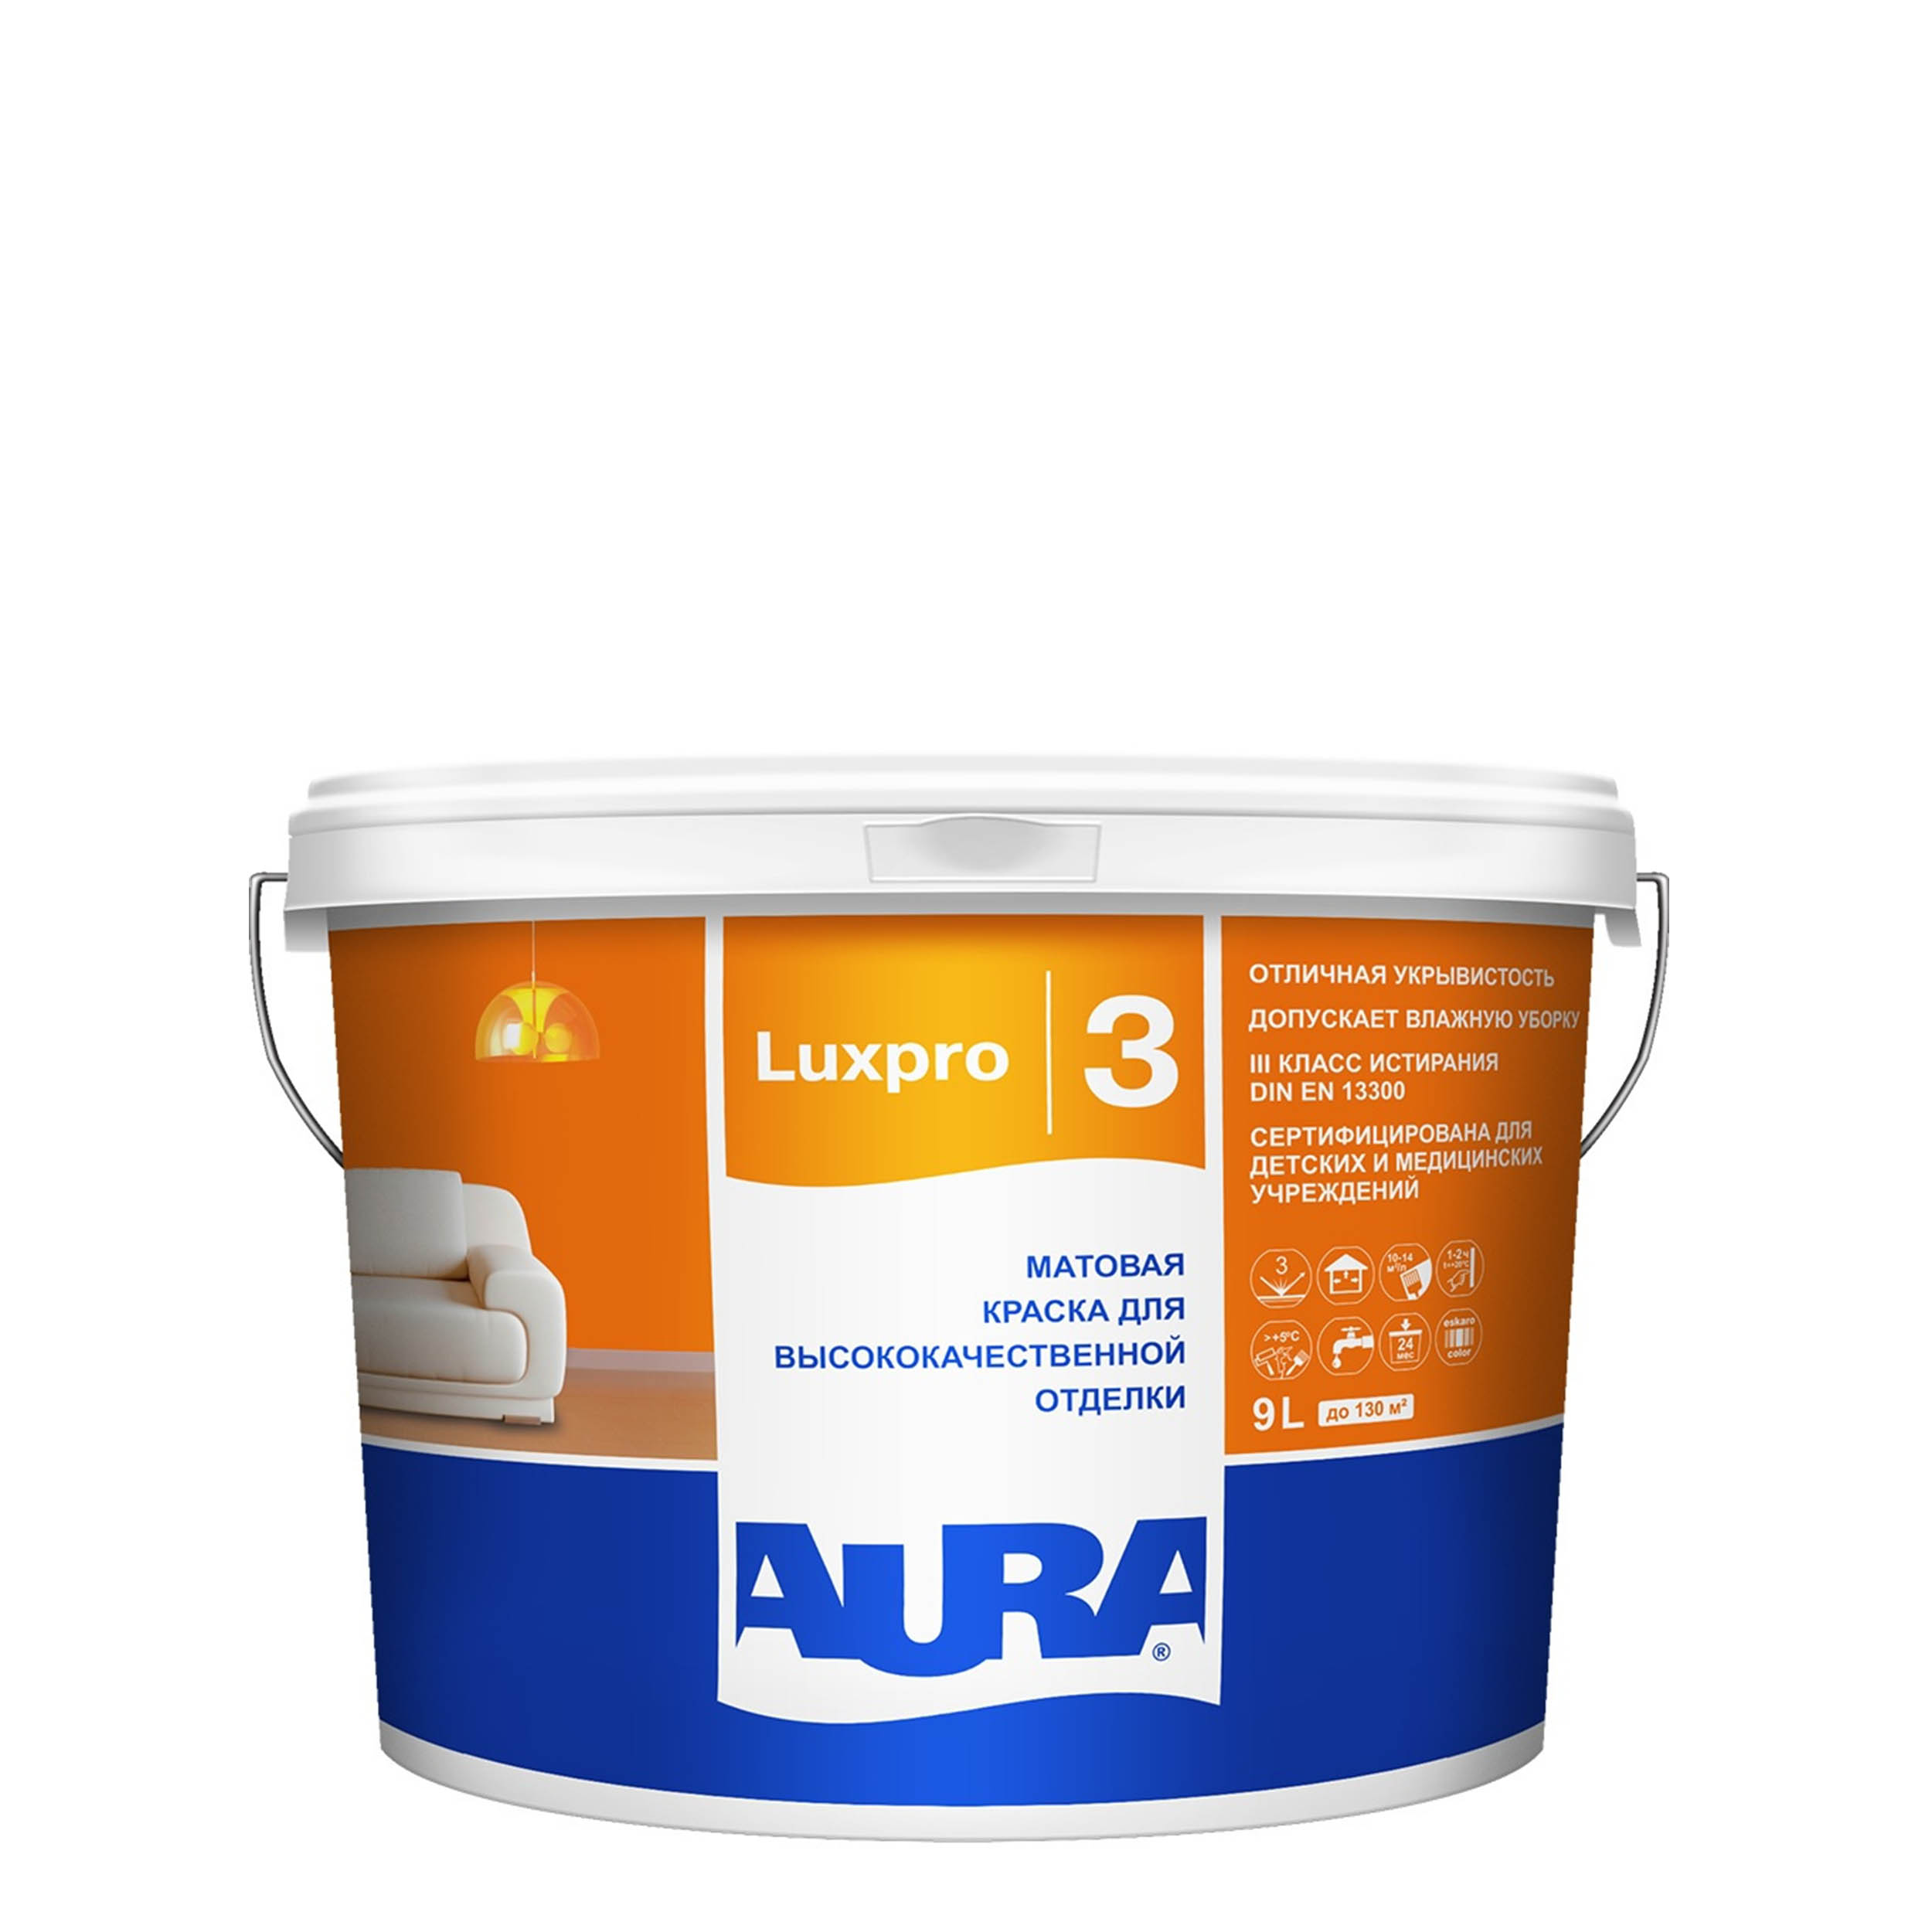 Фото 16 - Краска интерьерная, Aura LuxPRO 3, RAL 1018, 11 кг.